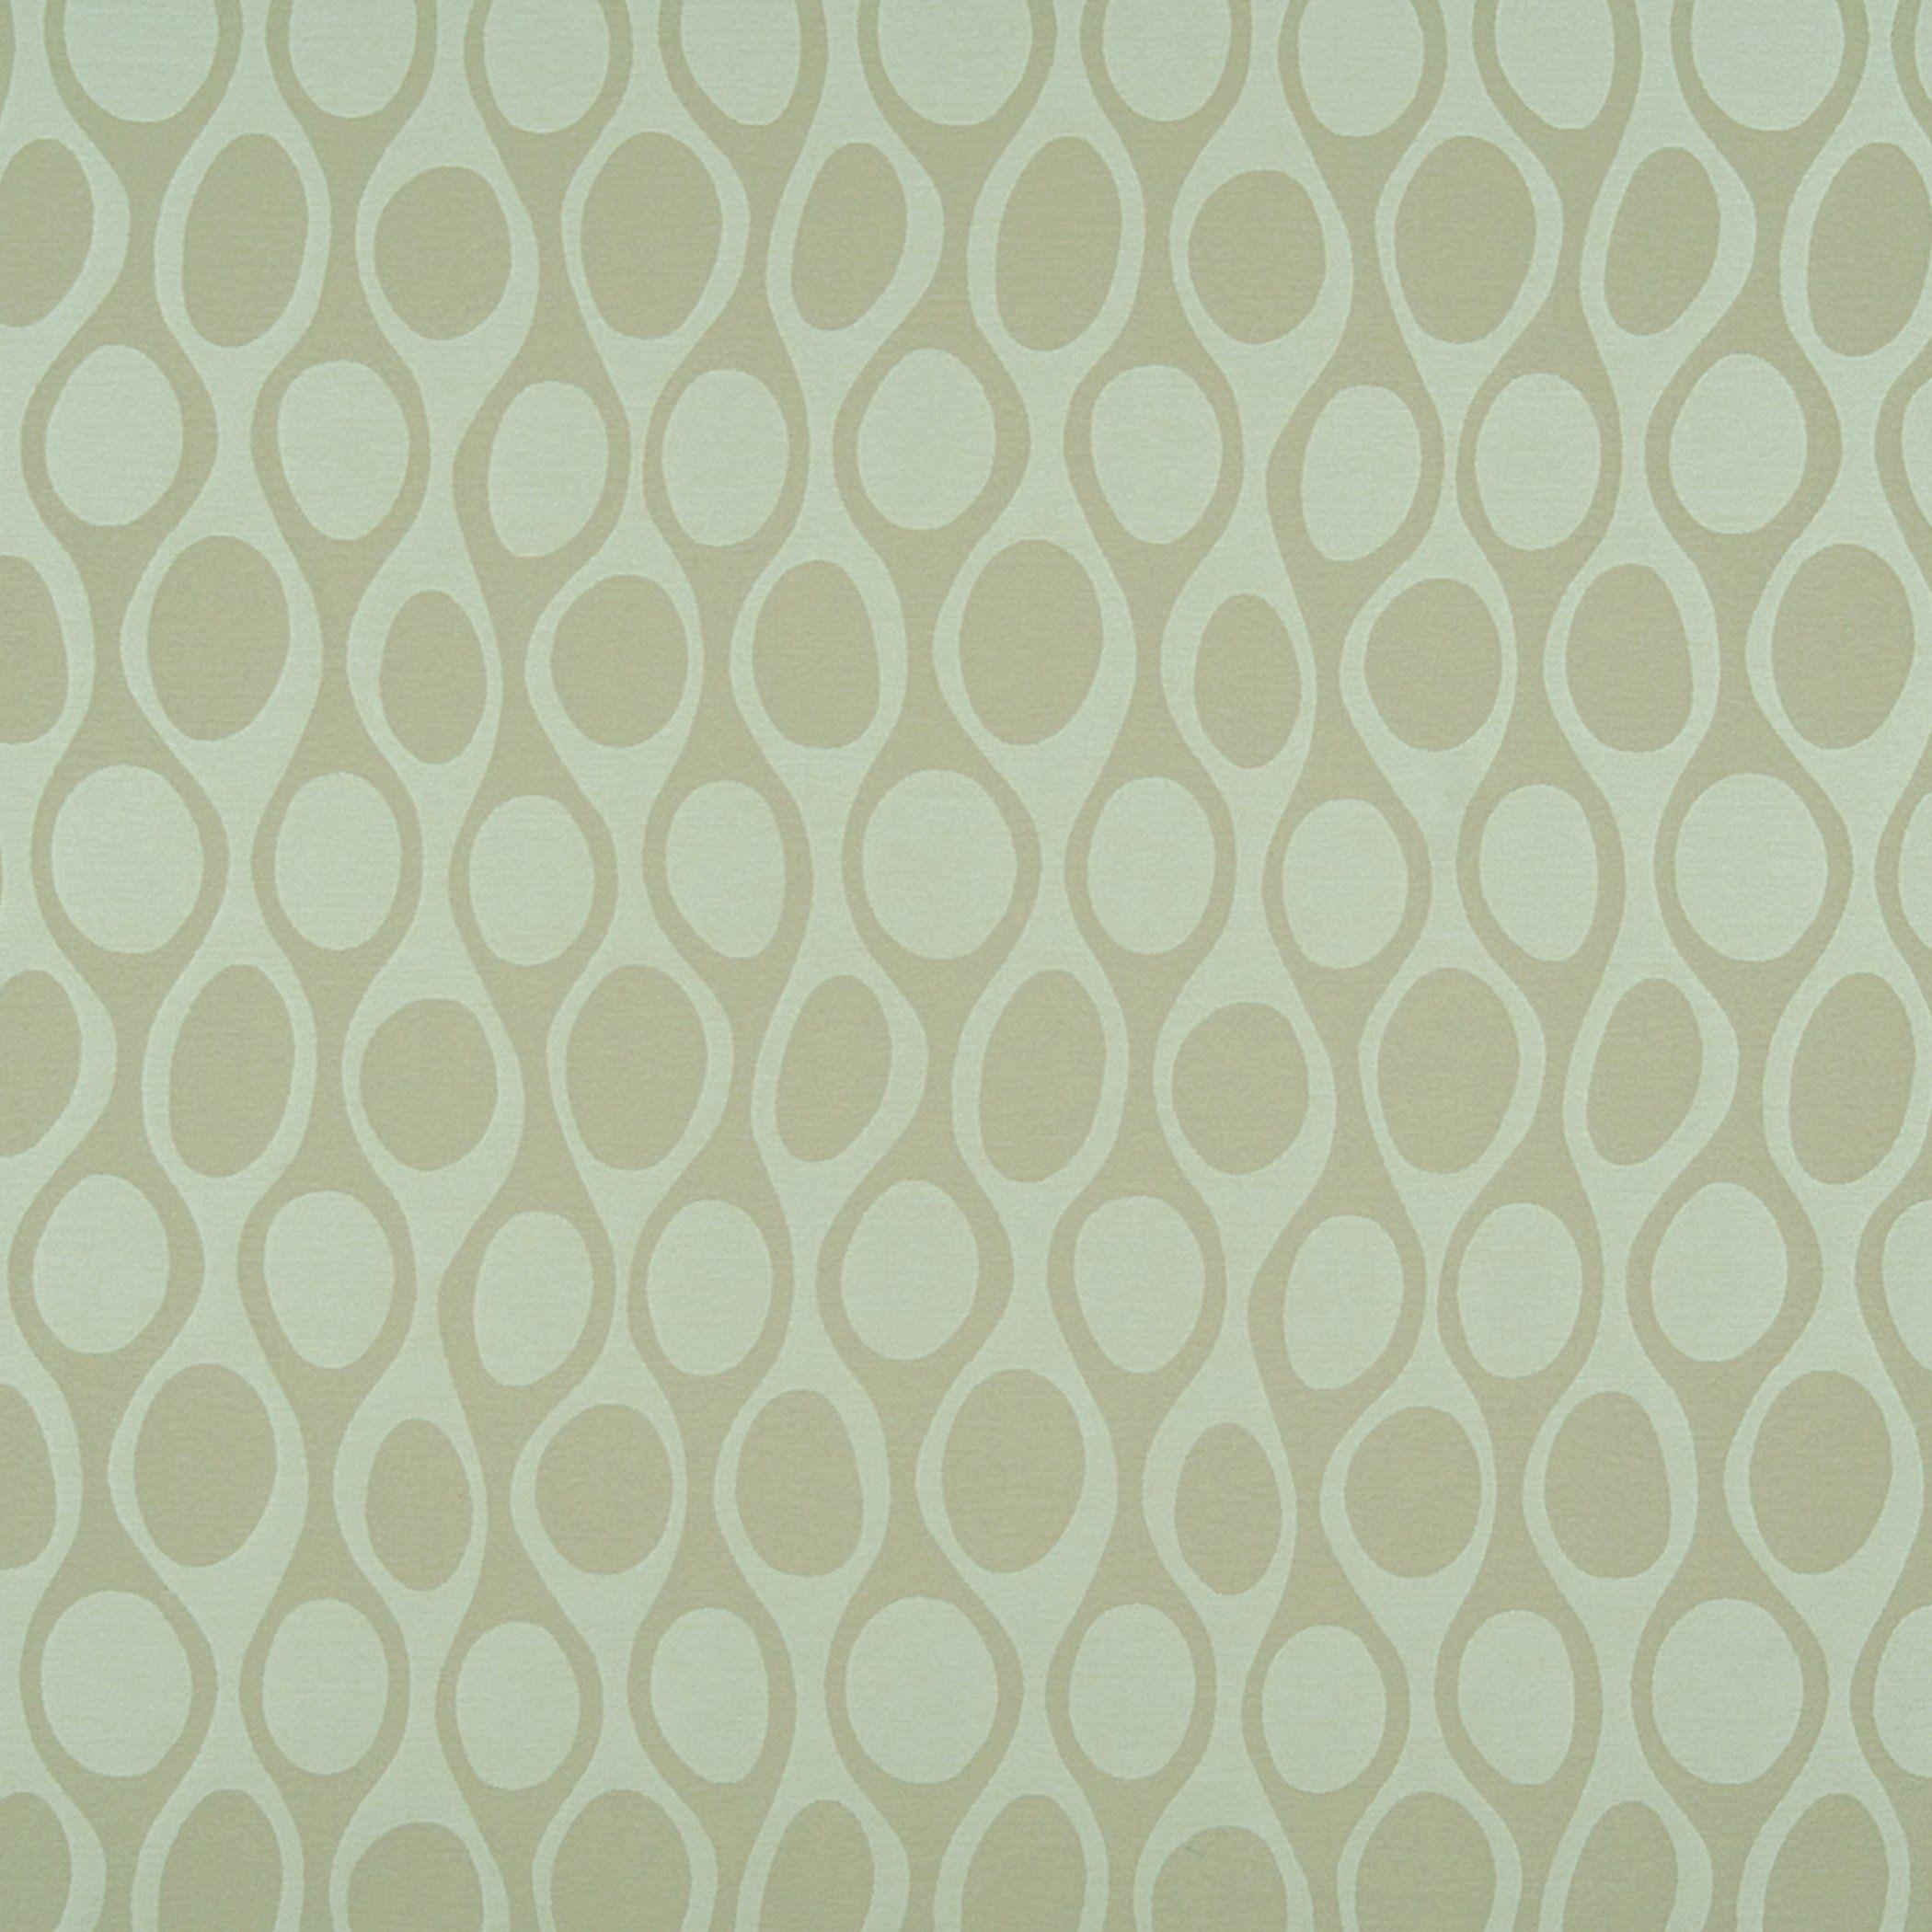 Kenga Pool Green Yellow Mint Seafoam Gold Curvilinear Woven Fl Upholstery Fabric